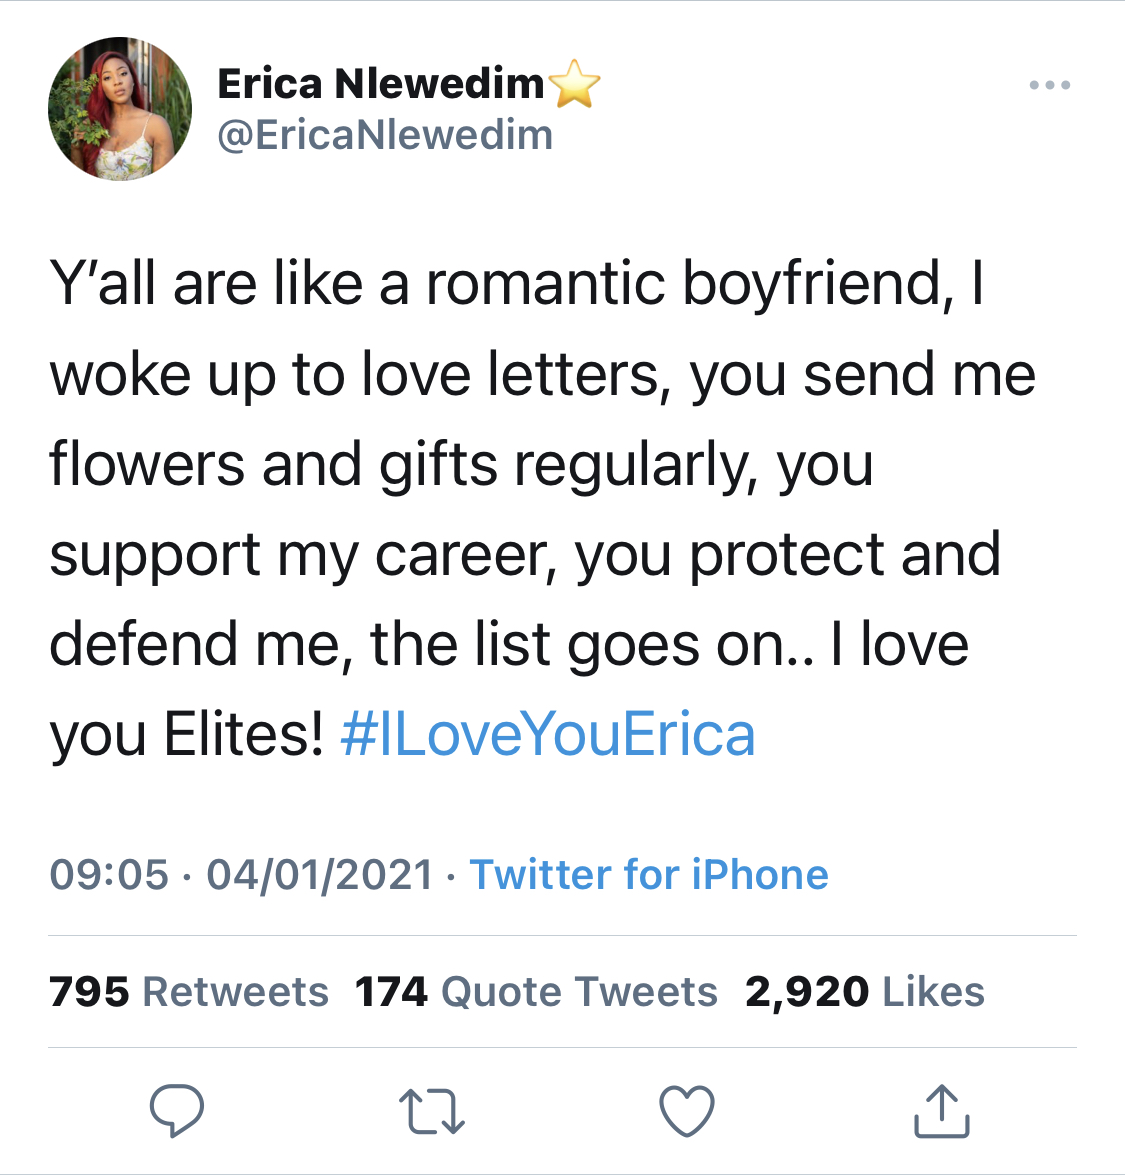 The reality TV star's tweet